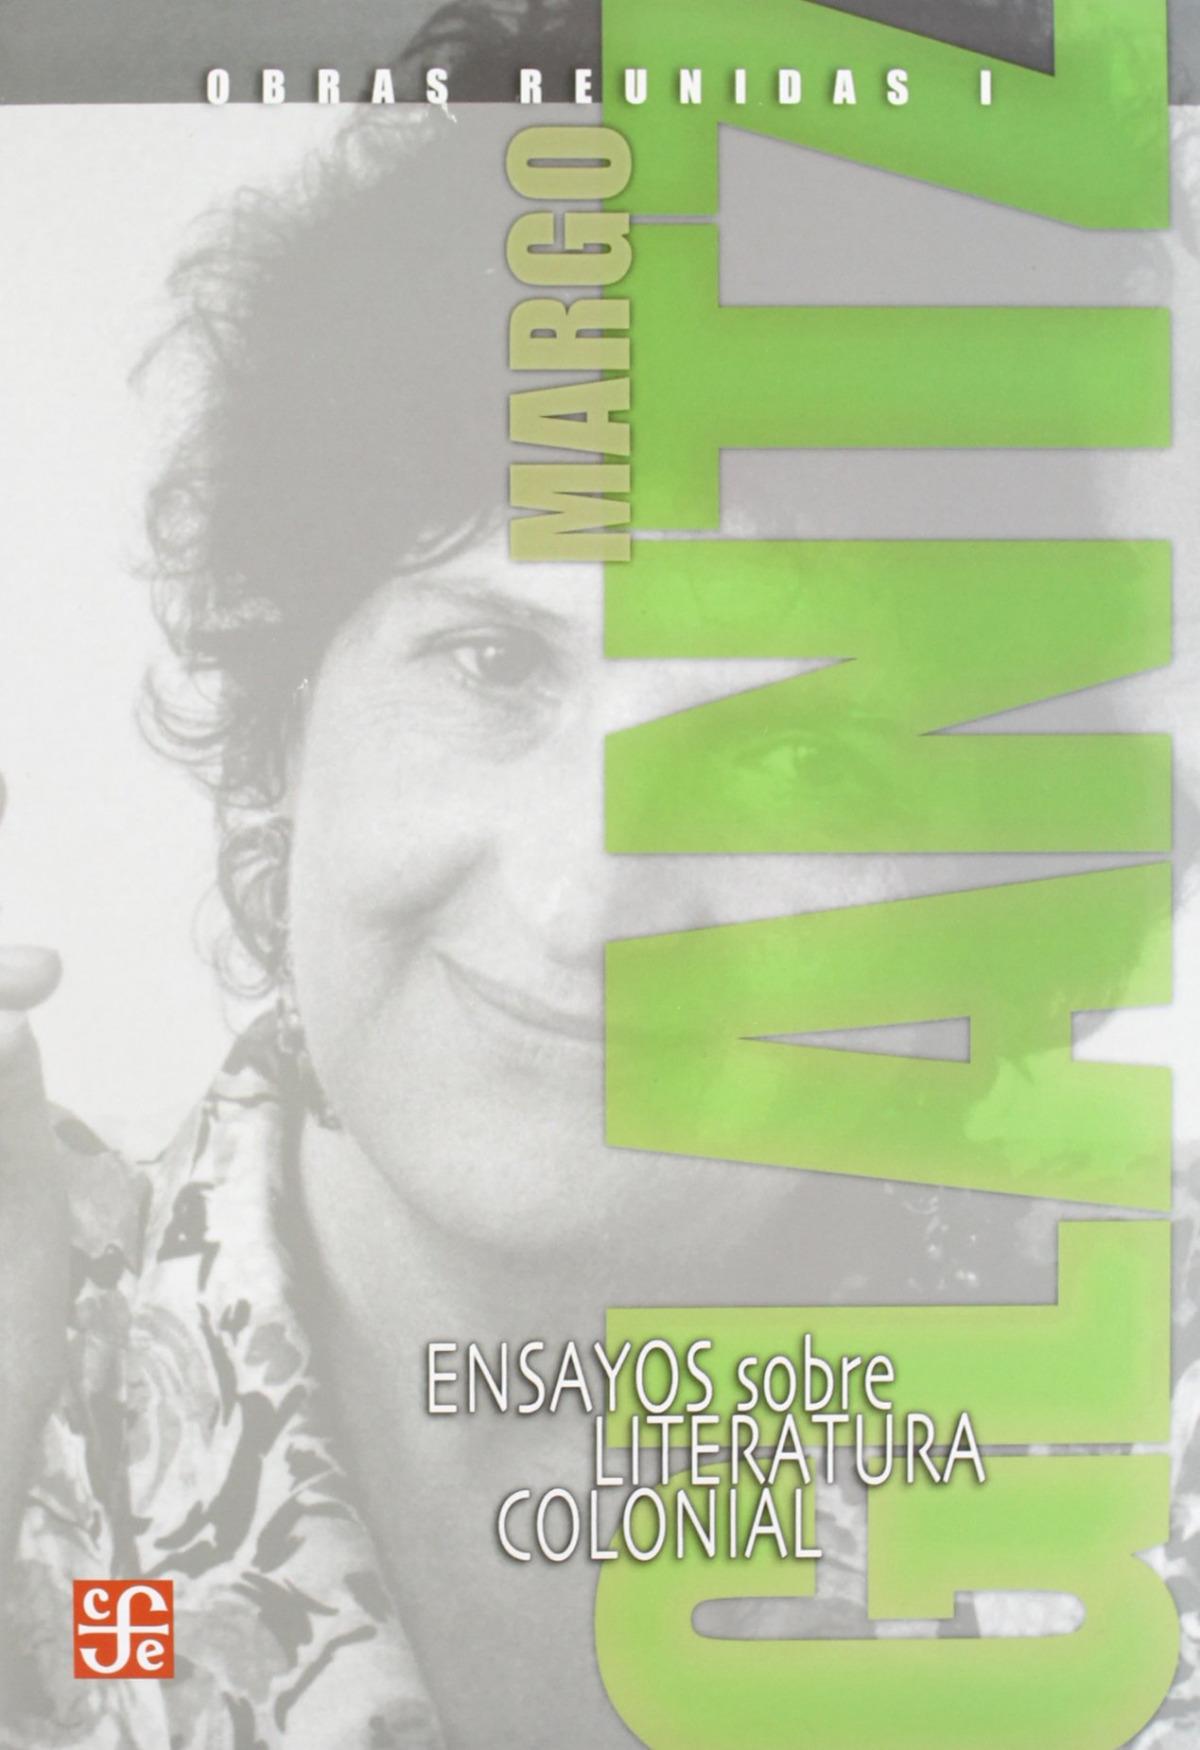 Obras reunidas I. Ensayos sobre literatura colonial